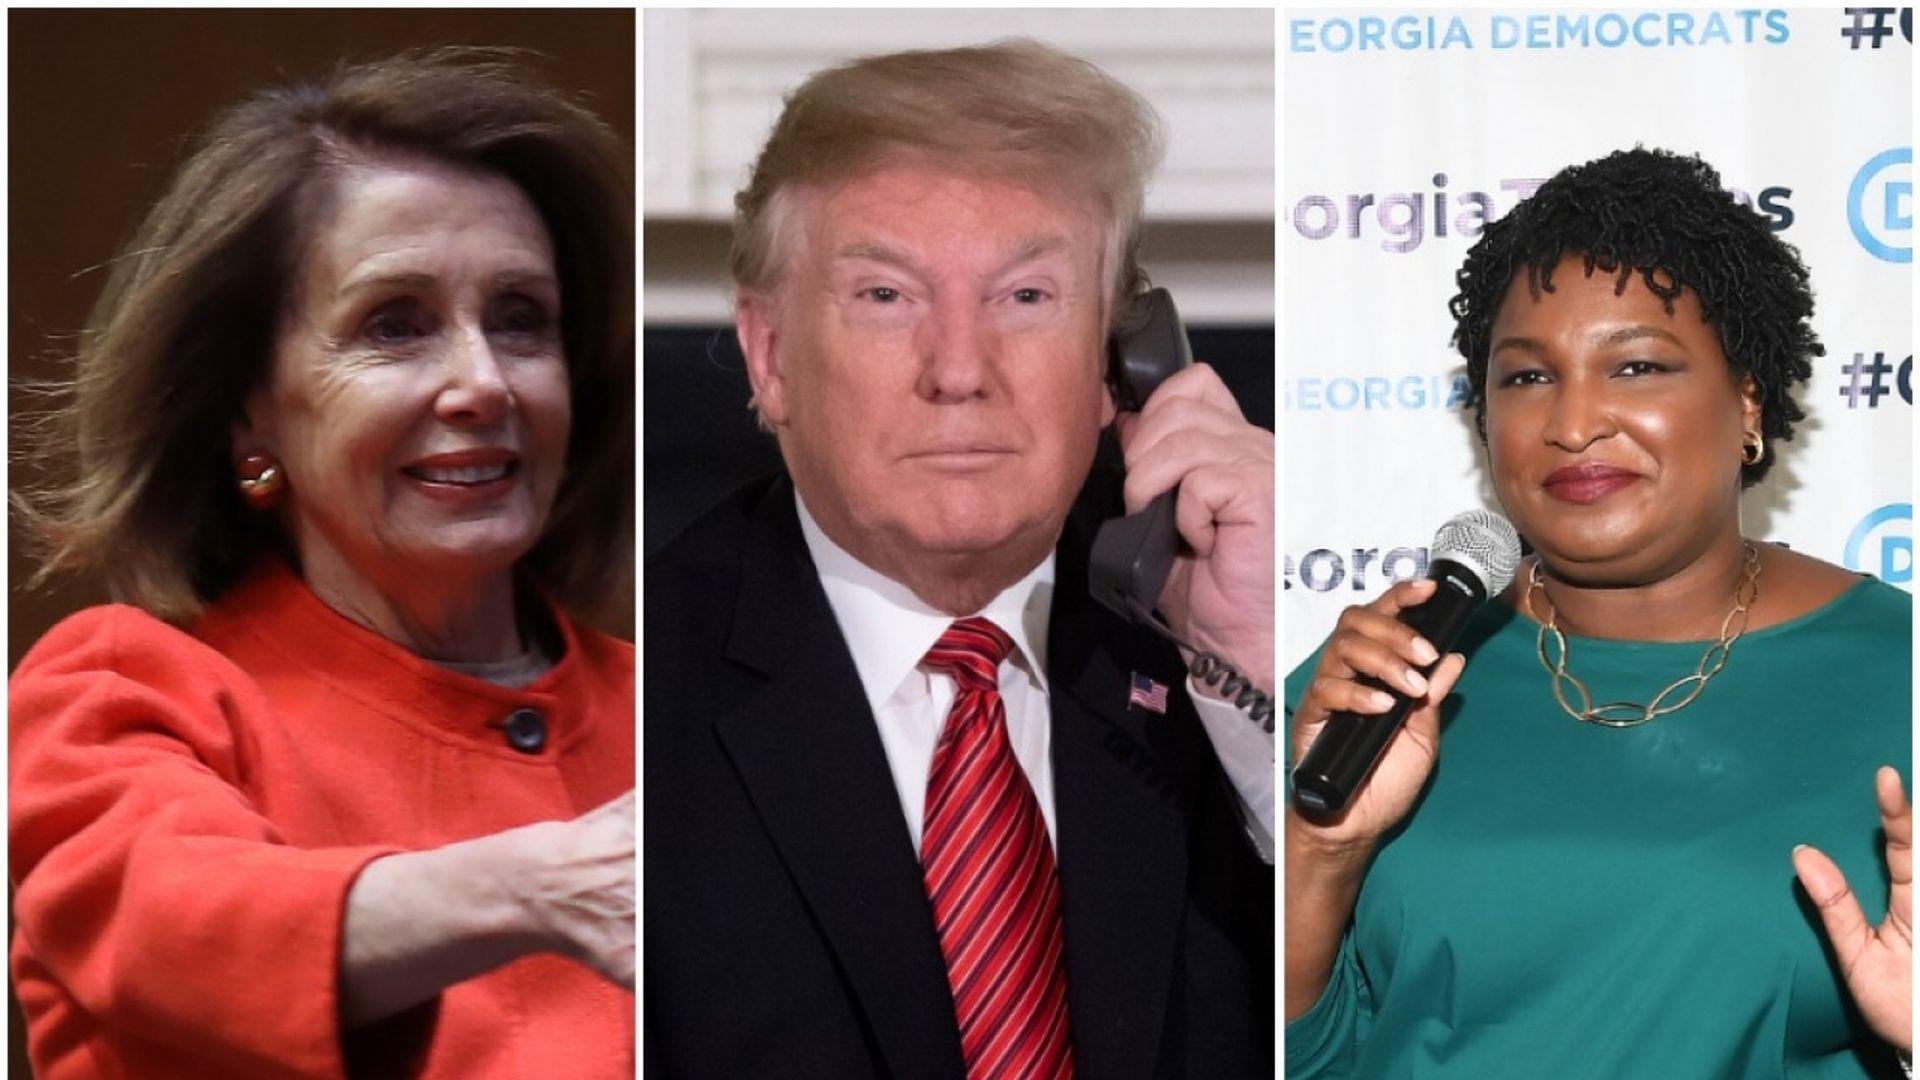 Pelosi, Trump, Abrams in split screen.